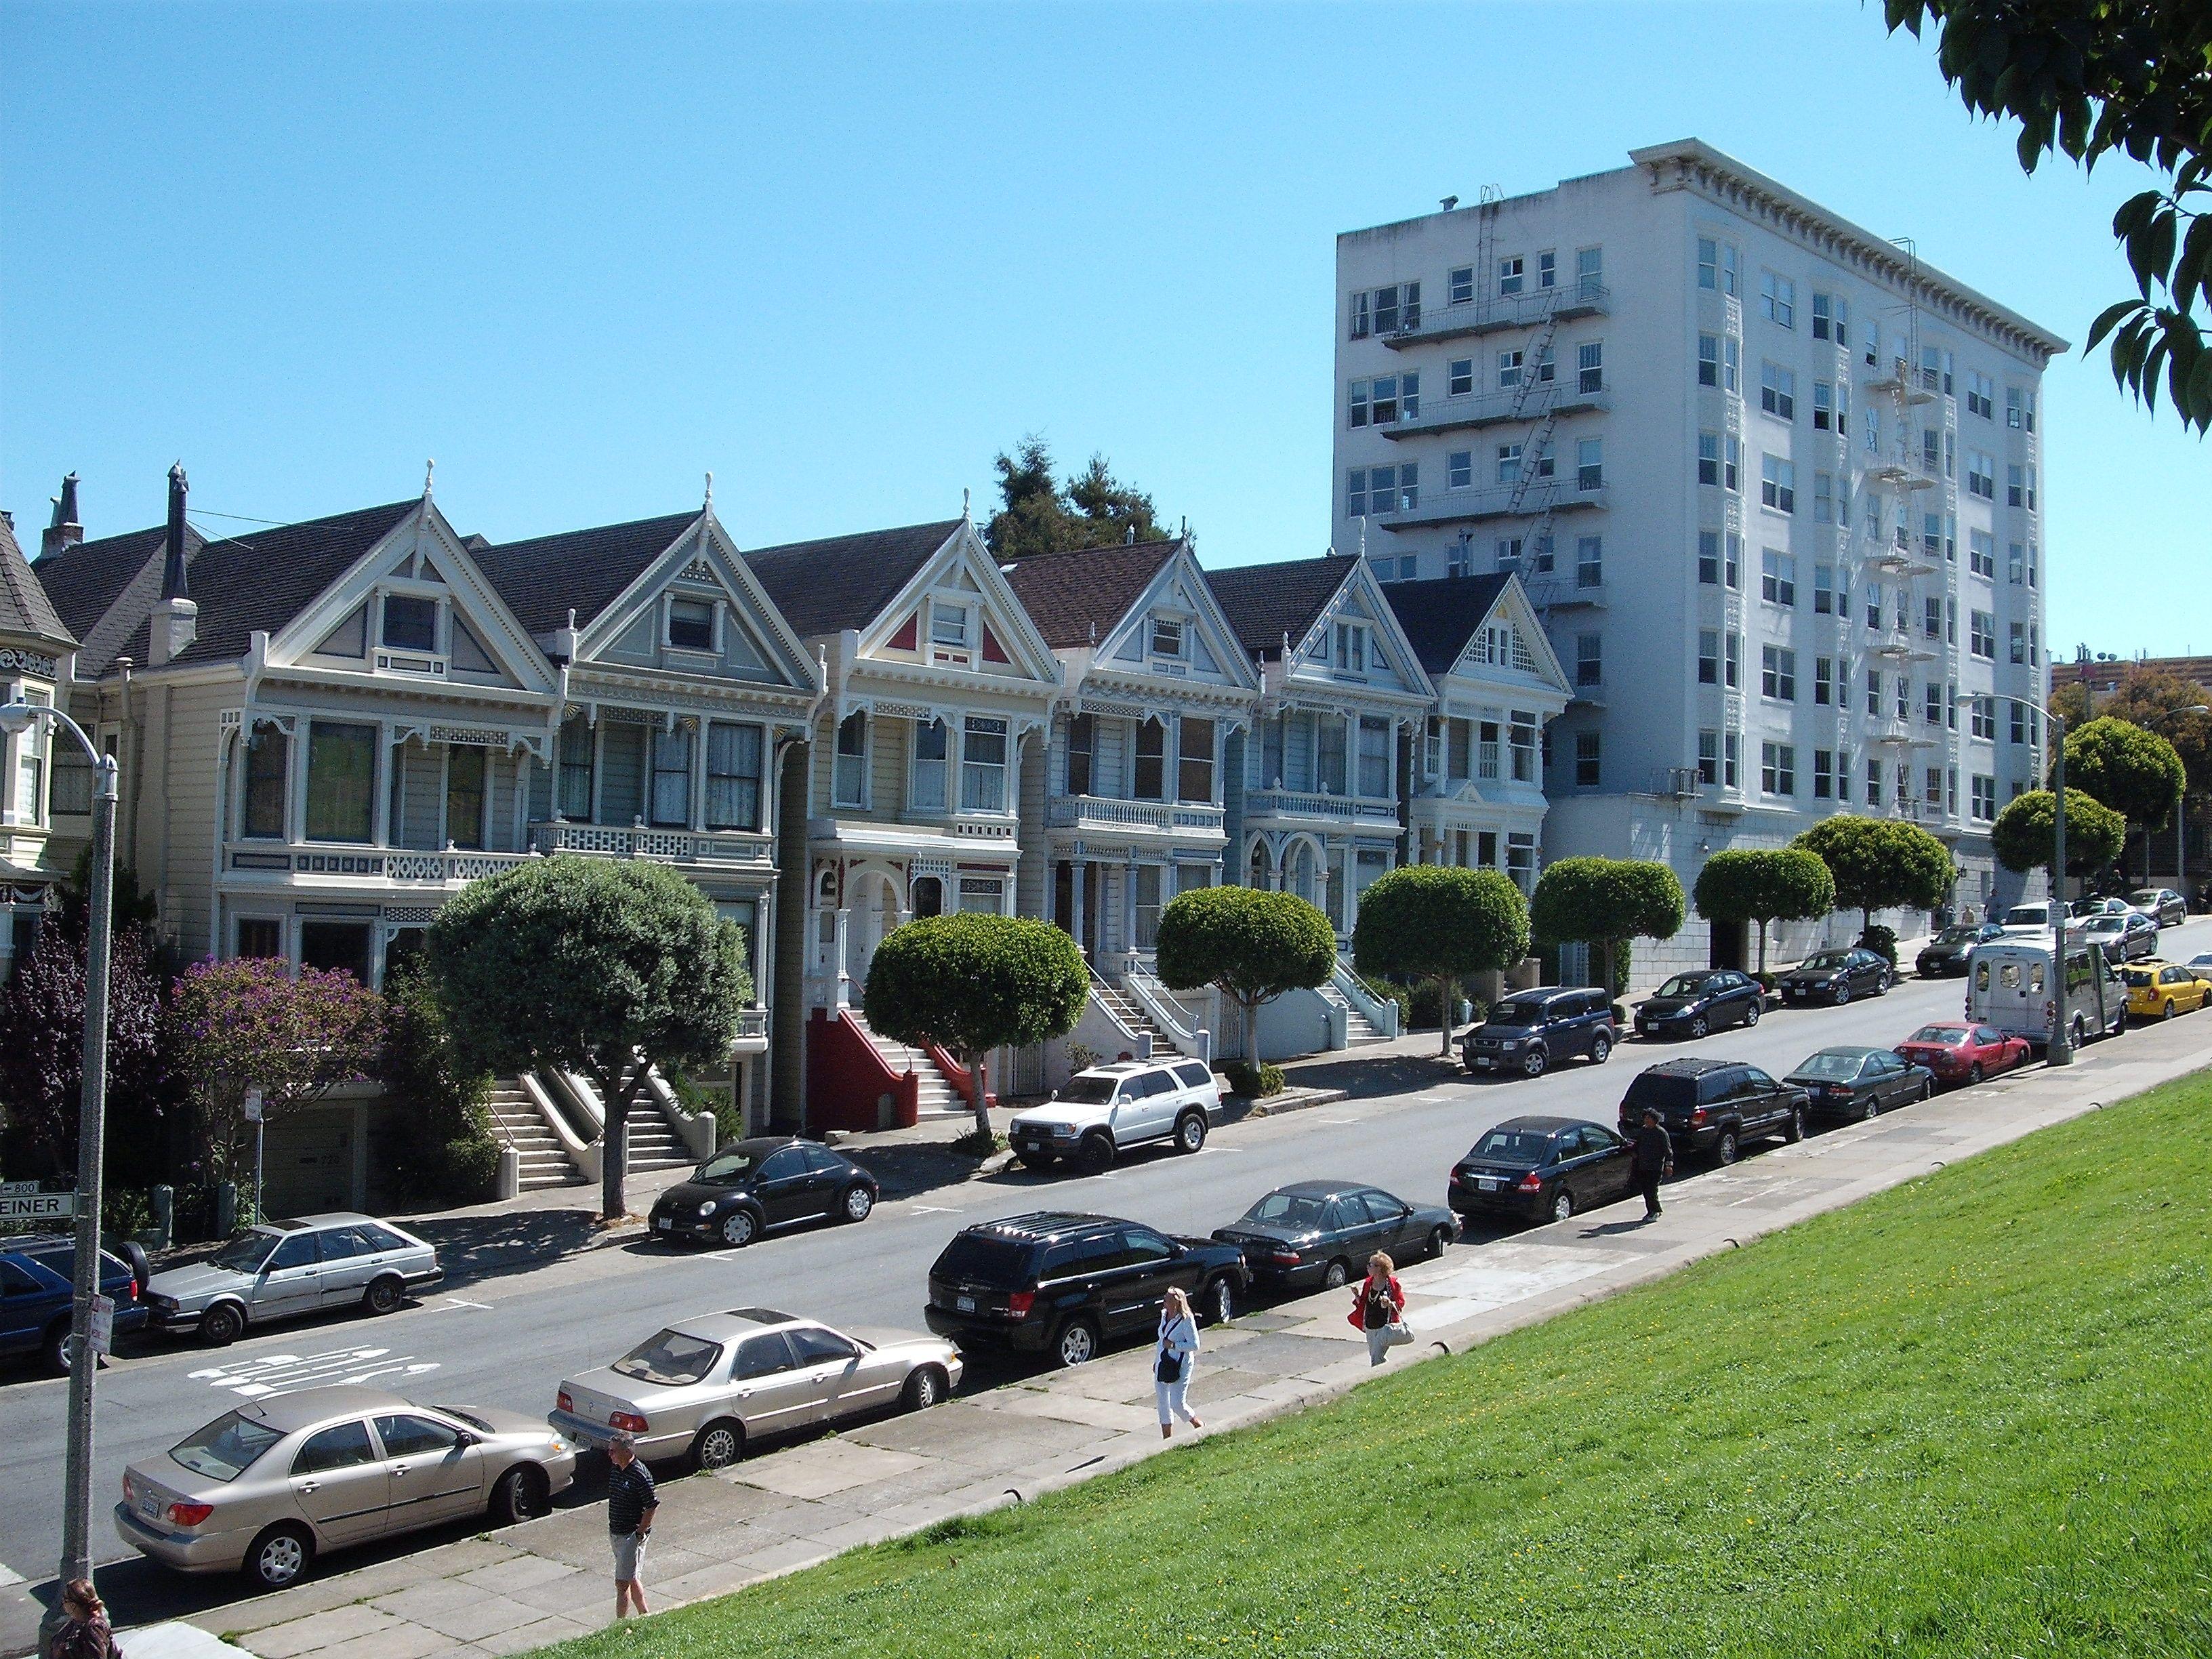 San Francisco San, House styles, Francisco